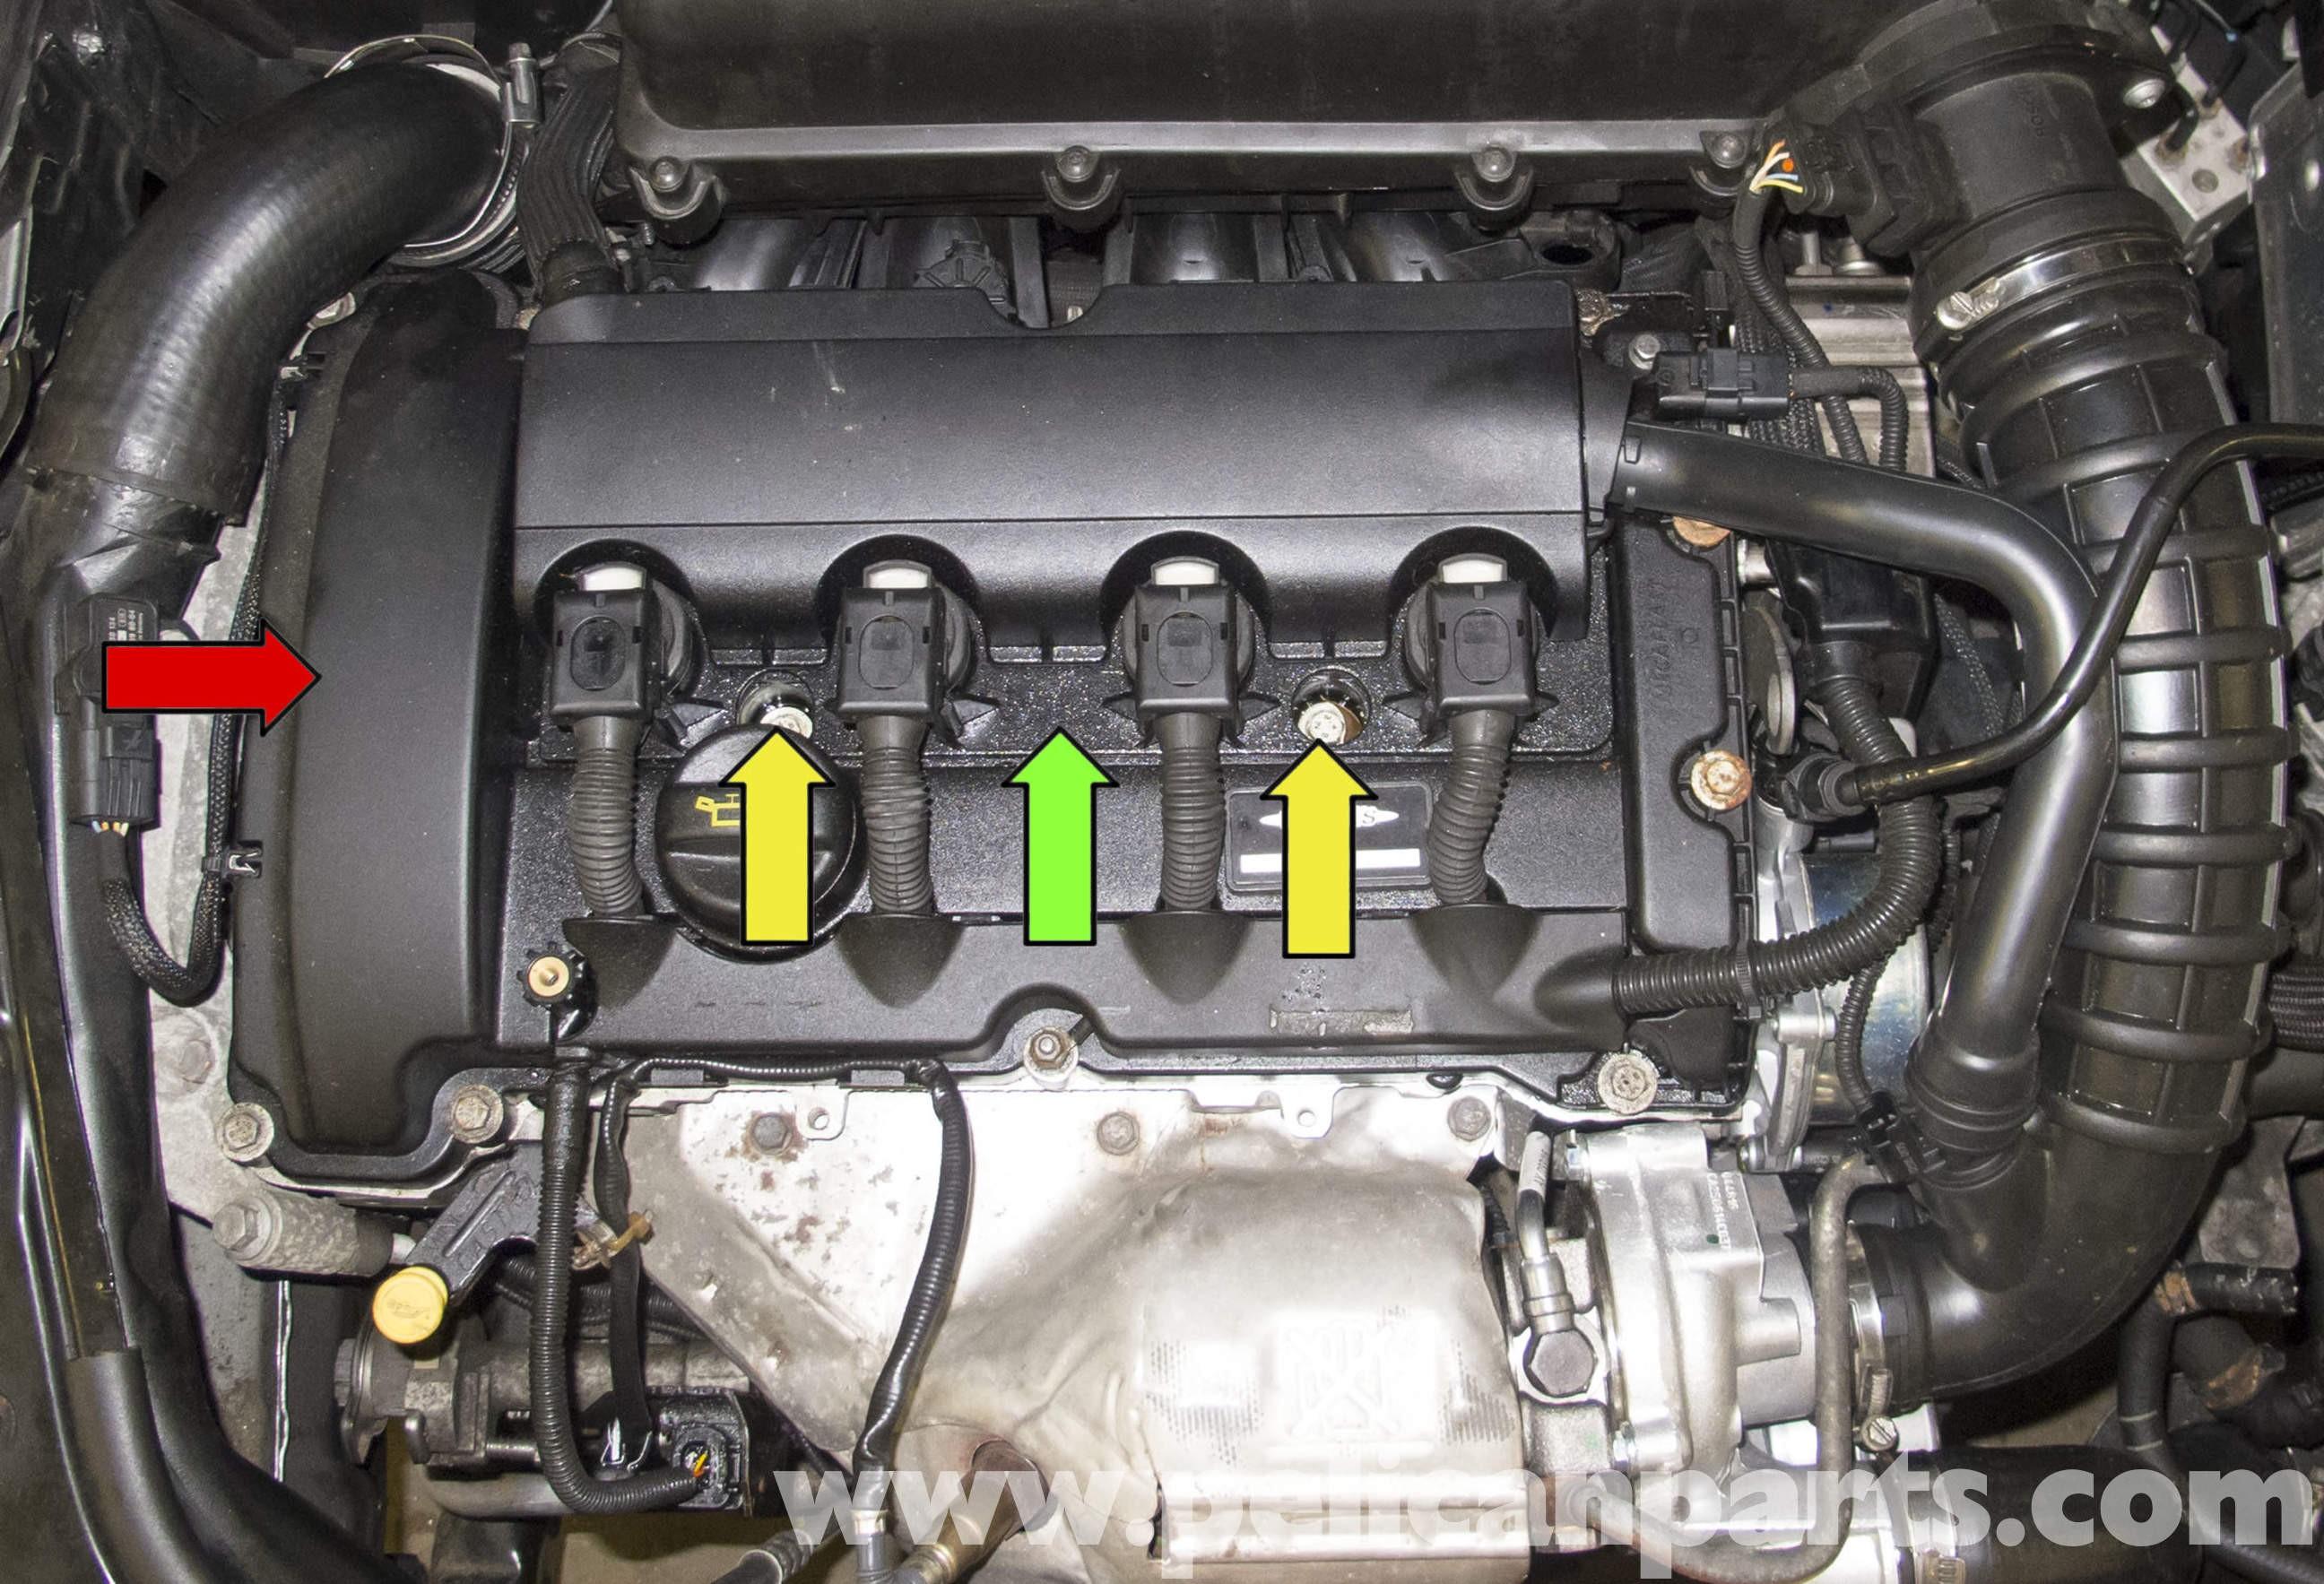 Mini Cooper Engine Bay Diagram Mini Cooper R56 Oil Leak Diagnosis 2007 2011 Of Mini Cooper Engine Bay Diagram